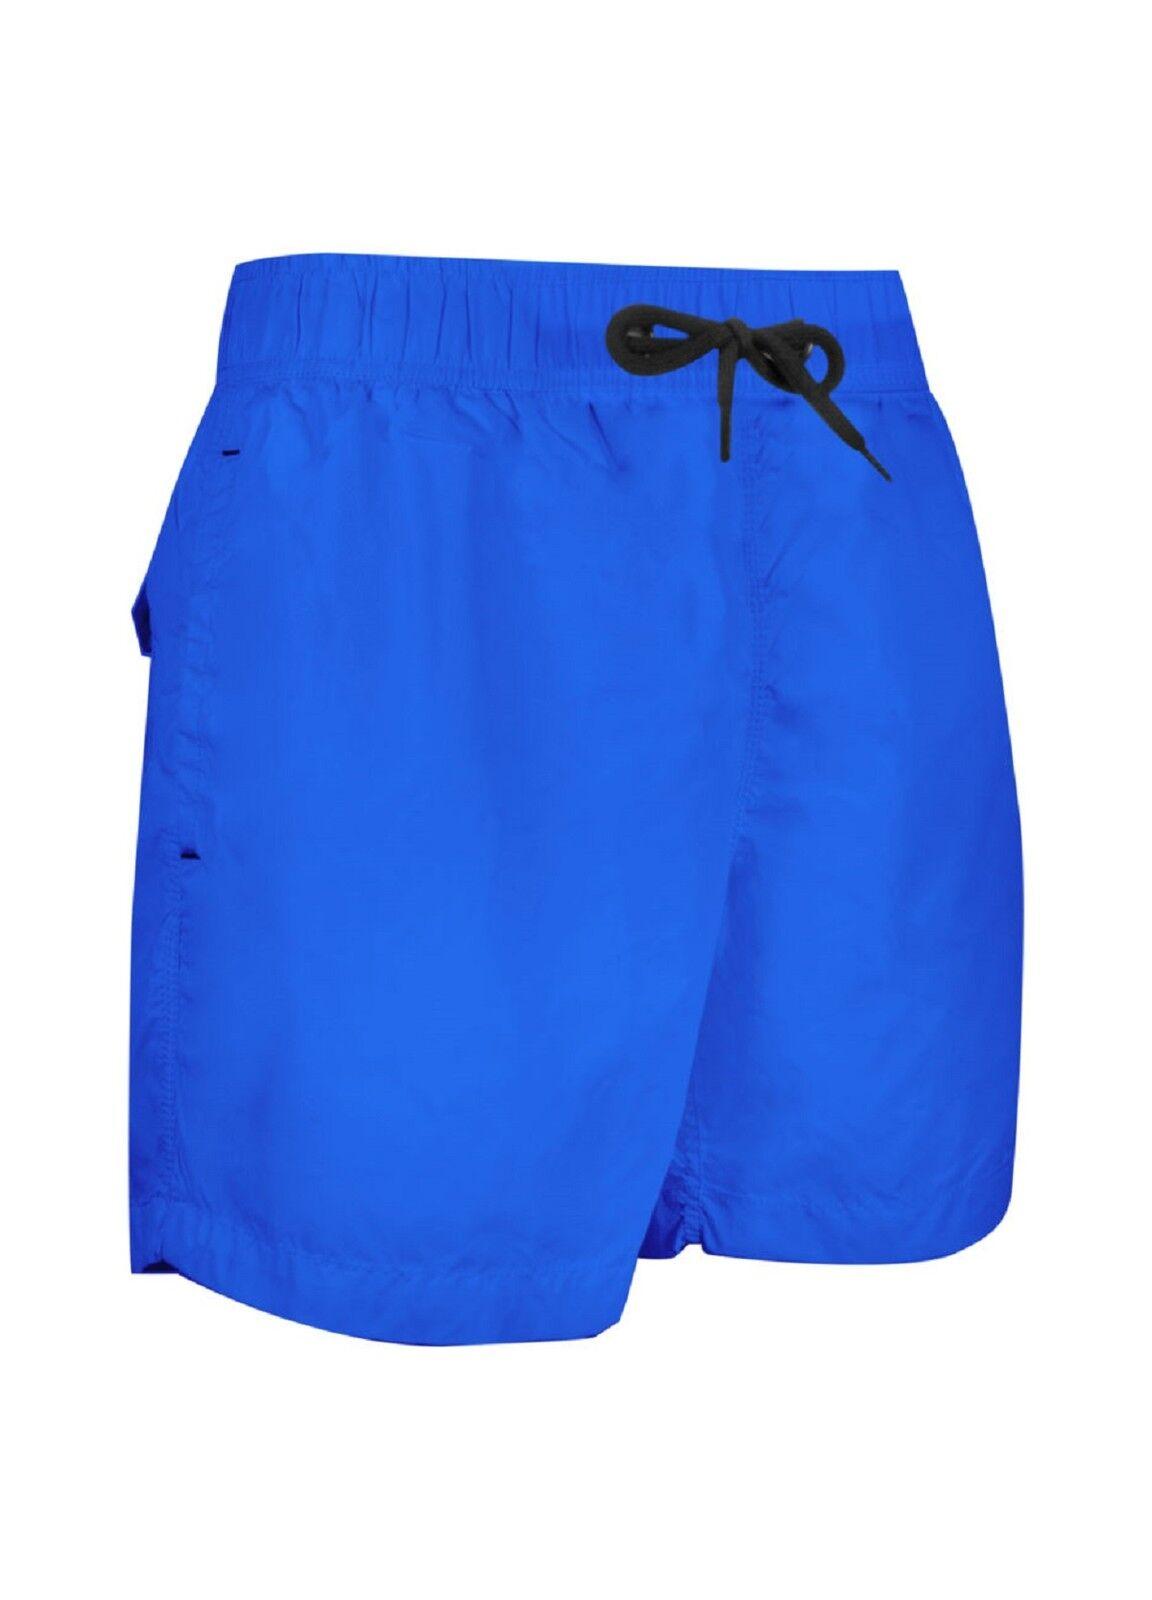 Costume Rrd 17009 61 tramontana blue opaco 61 medio ss 17